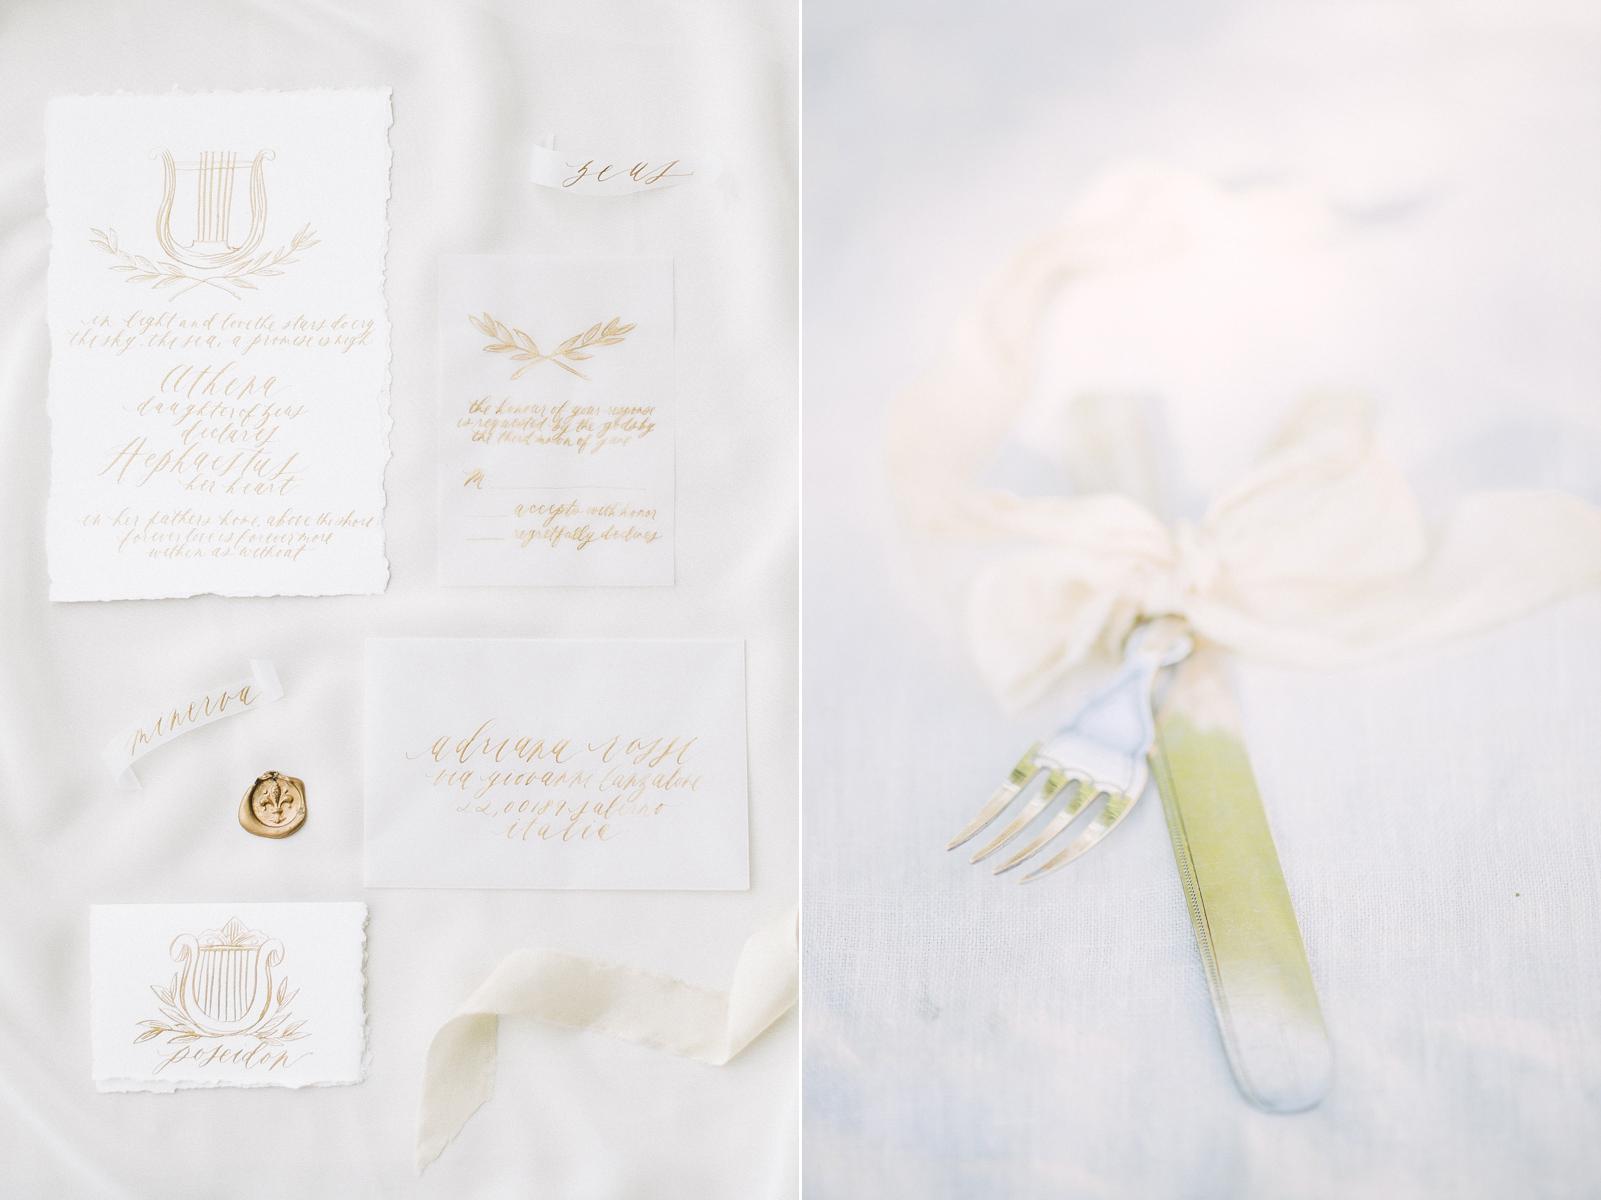 Boheme-Moon-wedding-photography-ravello-italy_13.jpg